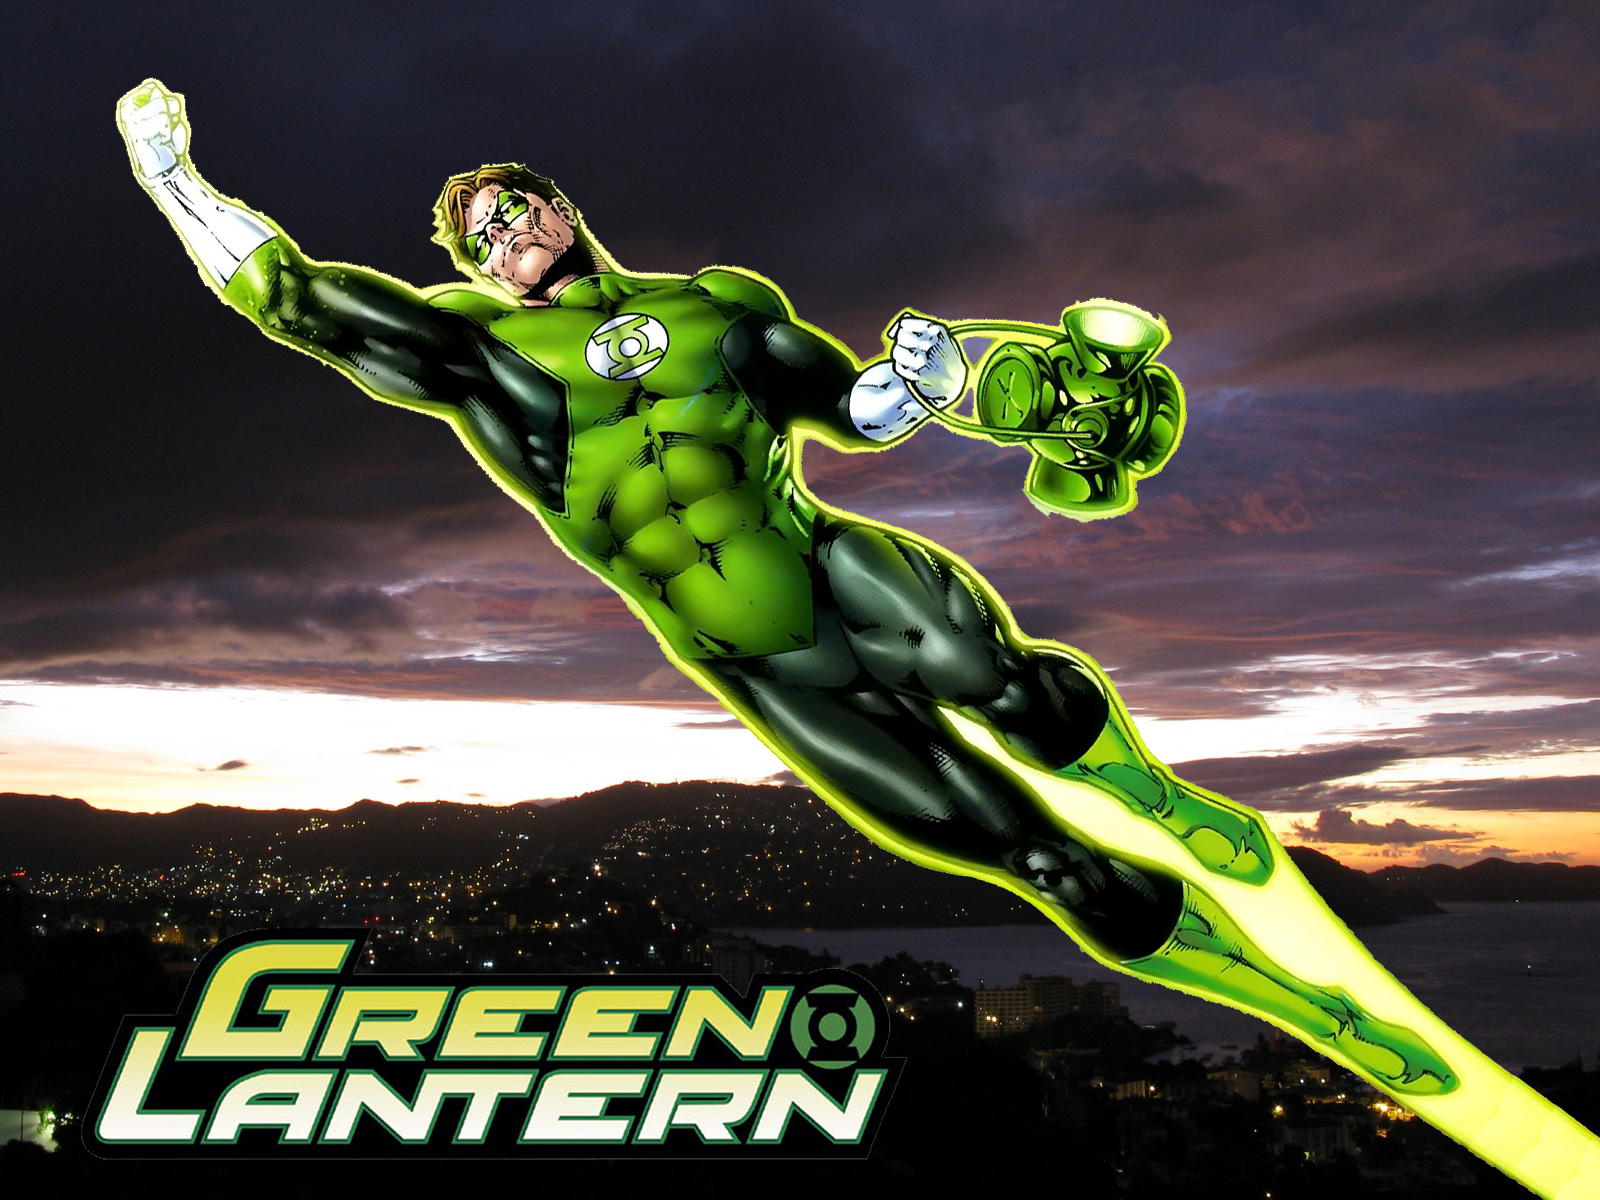 Green Lantern Comic Wallpaper: 261 Green Lantern HD Wallpapers